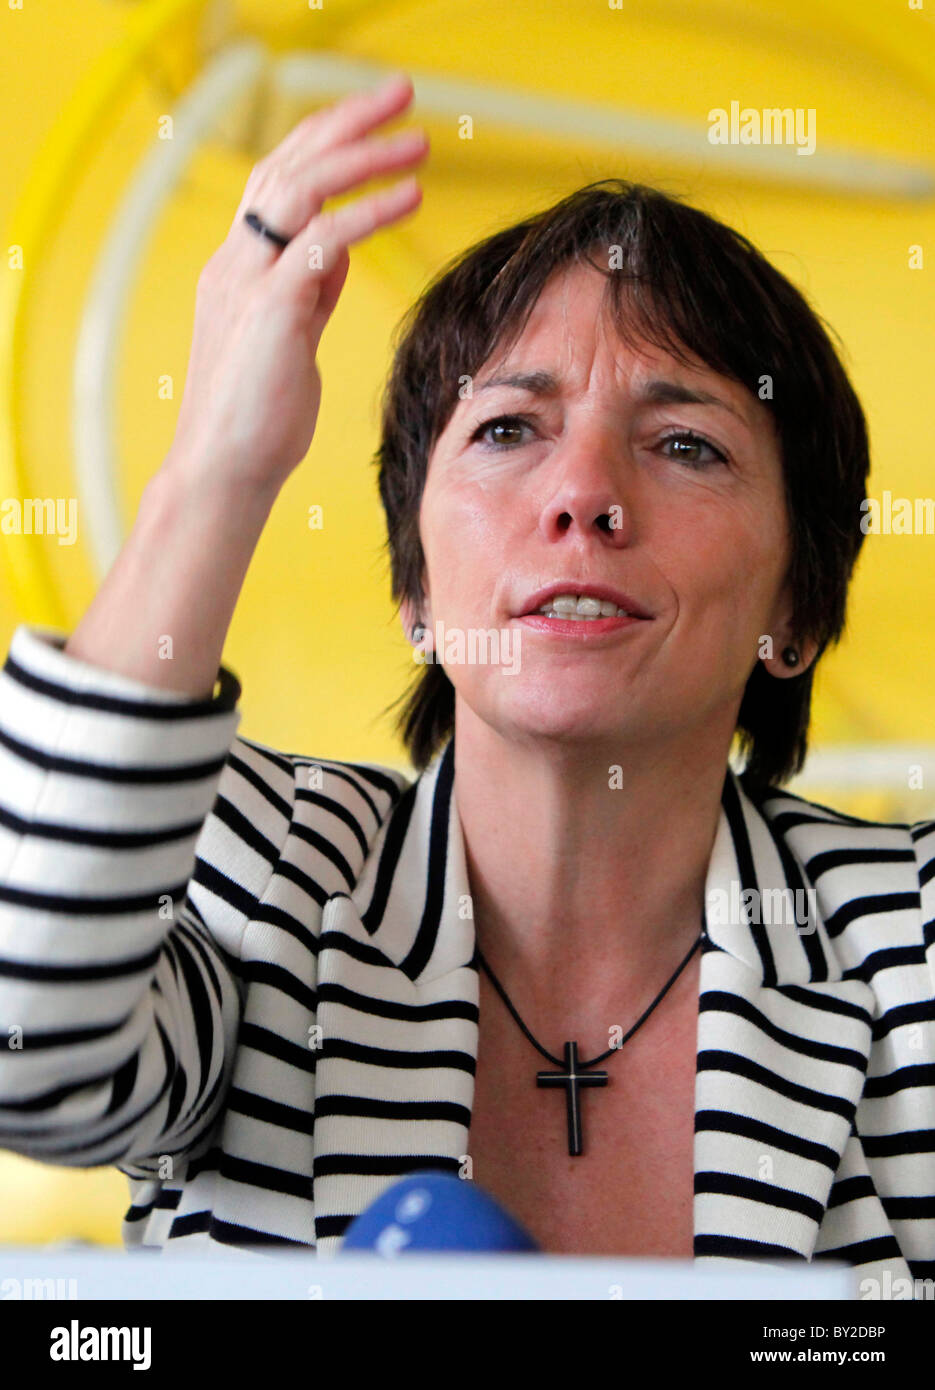 Prof. Dr. Margot Kaessmann, Ruhr University Bochum, Germany - Stock Image